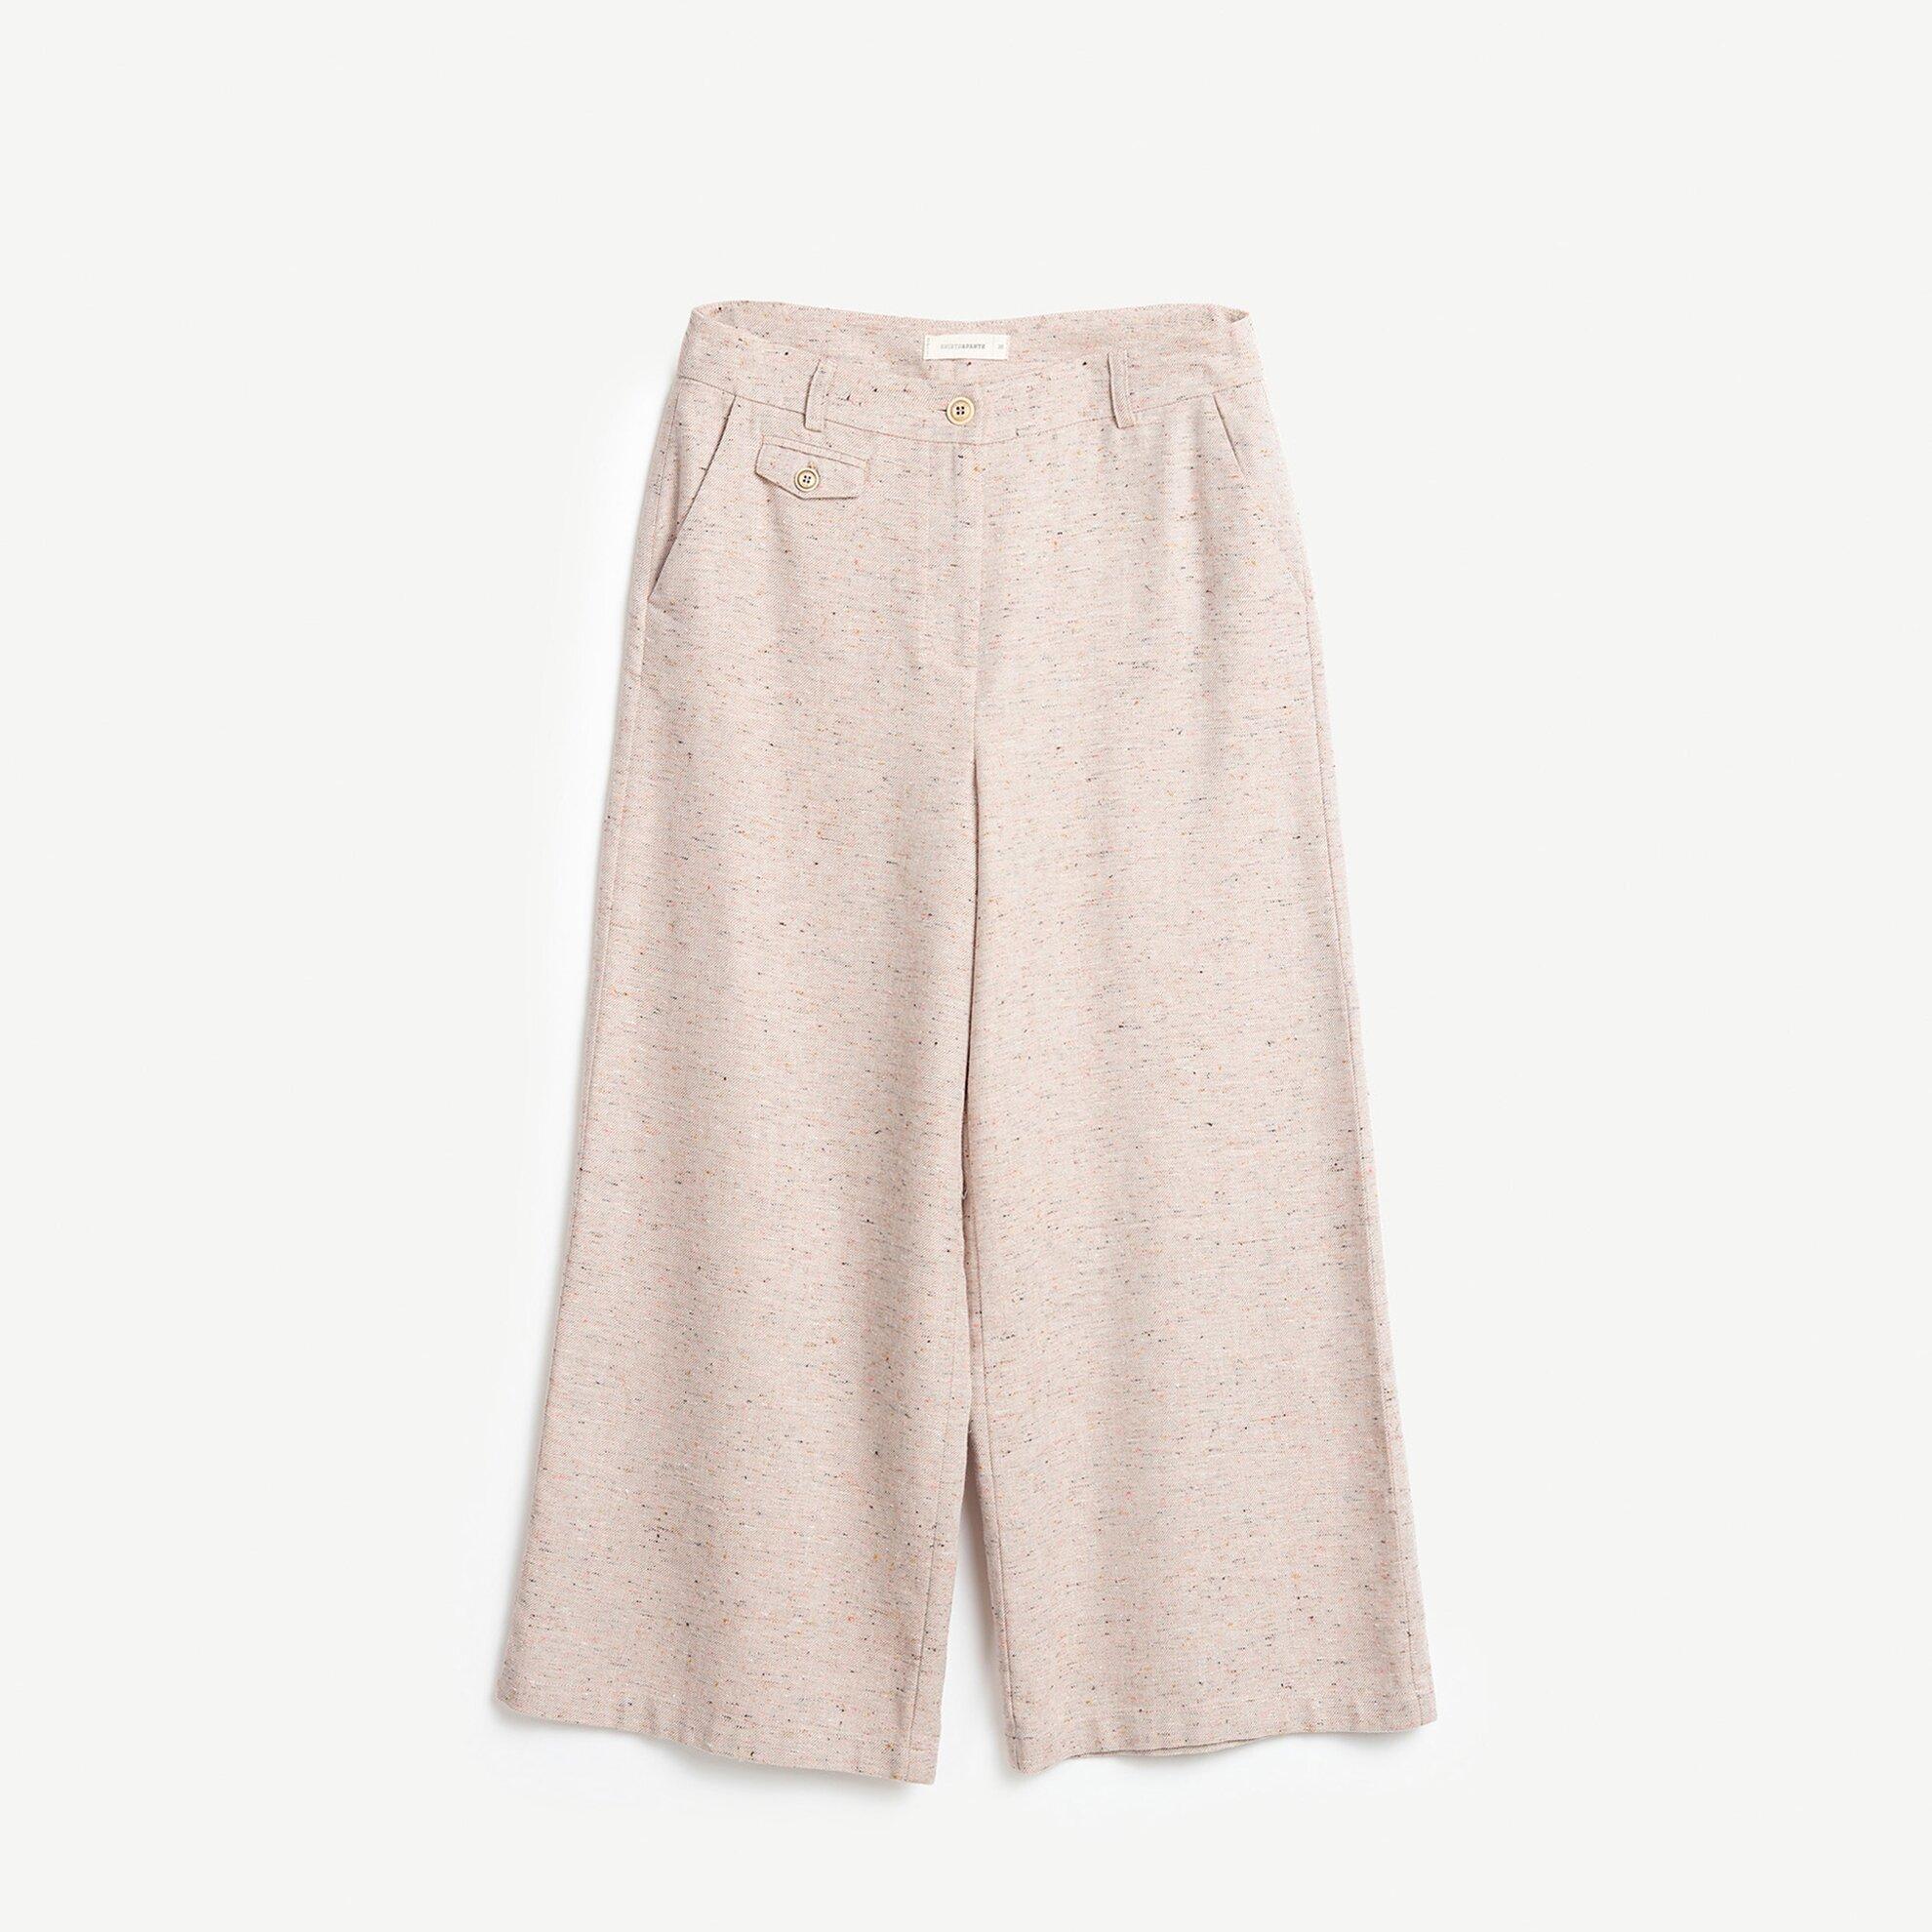 Cropped Geniş Paça Pantolon